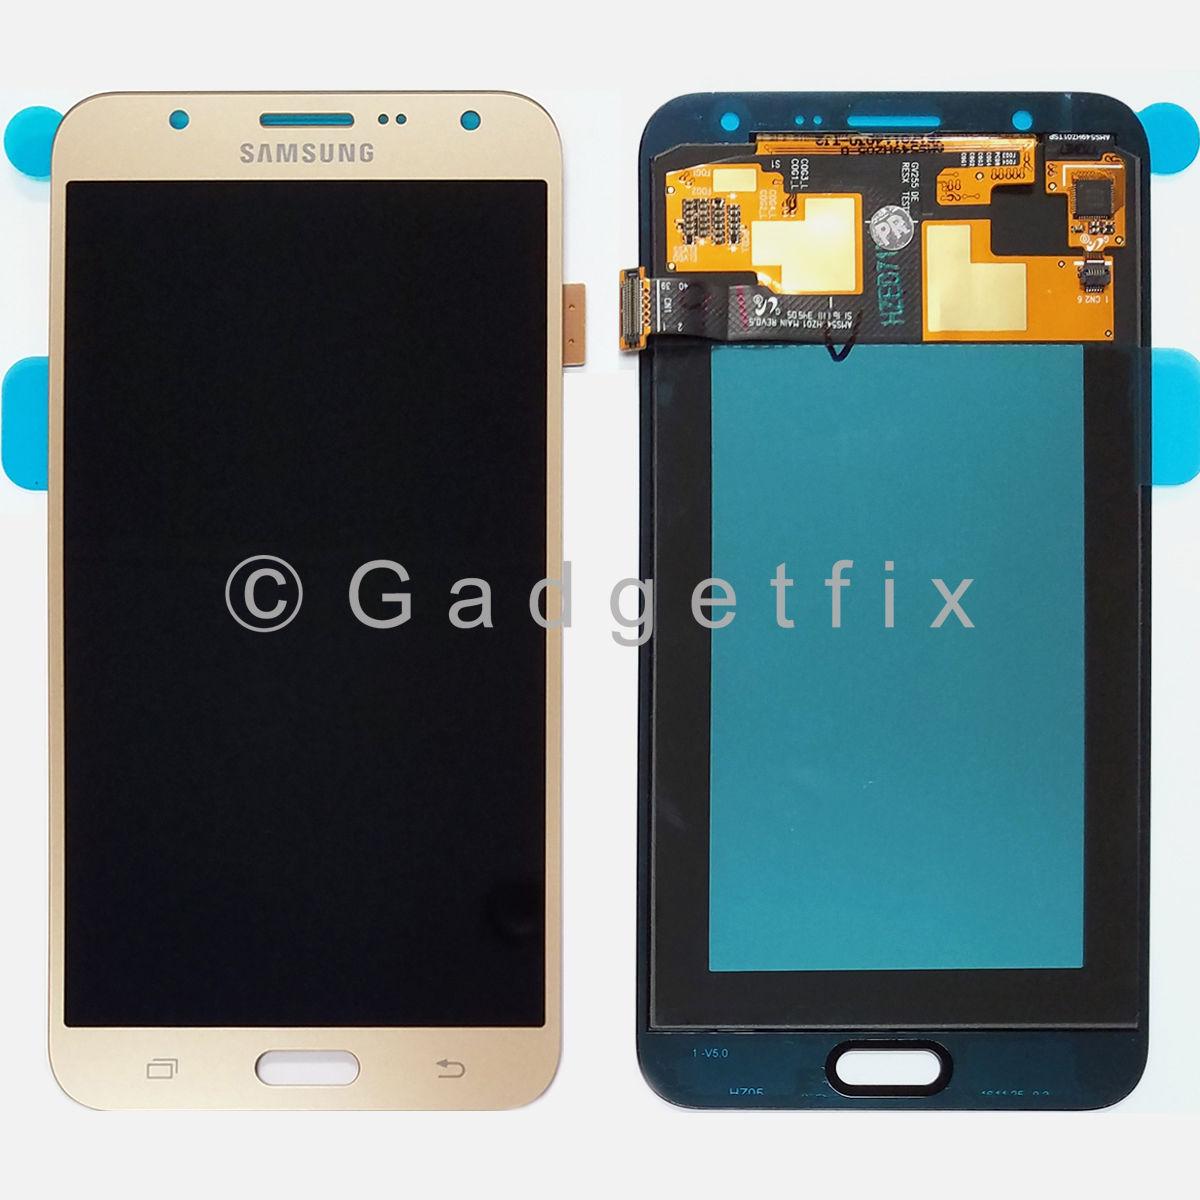 OEM Gold Samsung Galaxy J7 J700M J700H J700T LCD Display Touch Screen Digitizer